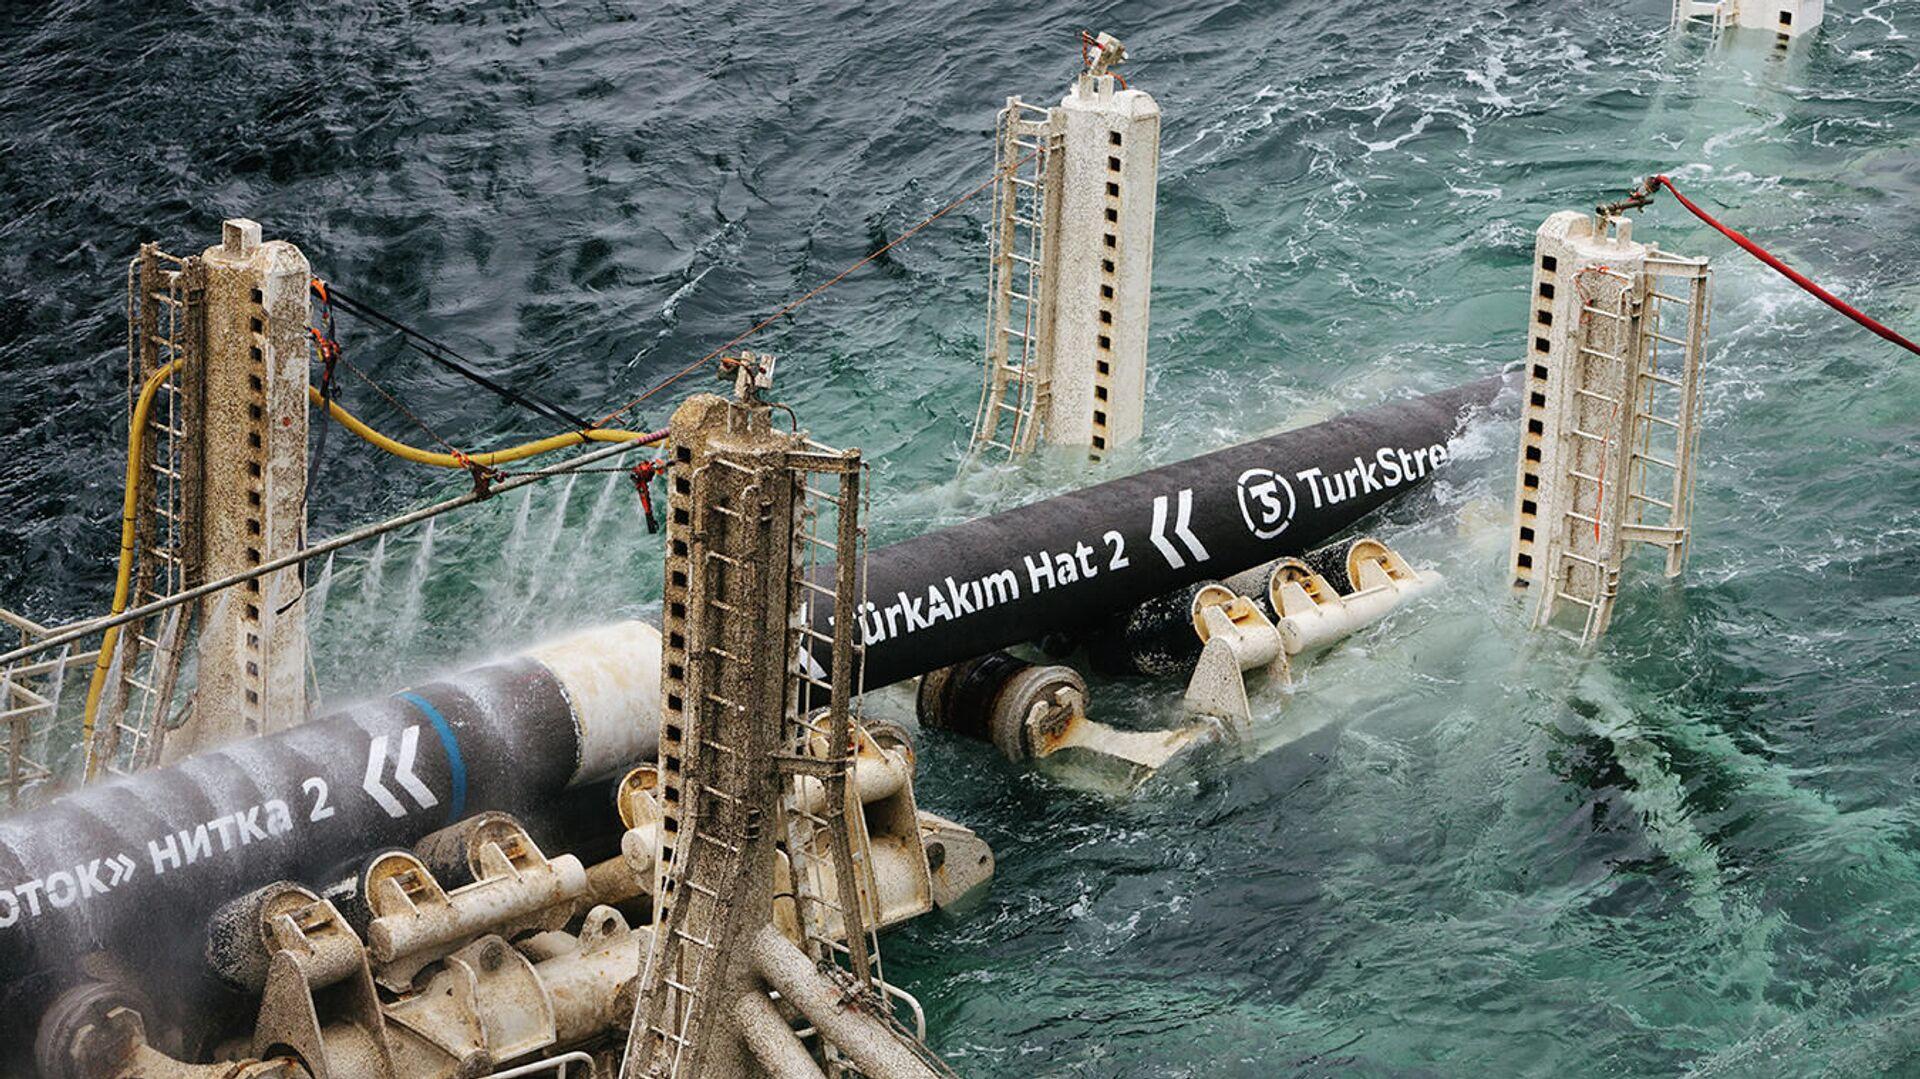 Il gasdotto Turkish Stream - Sputnik Italia, 1920, 17.05.2021